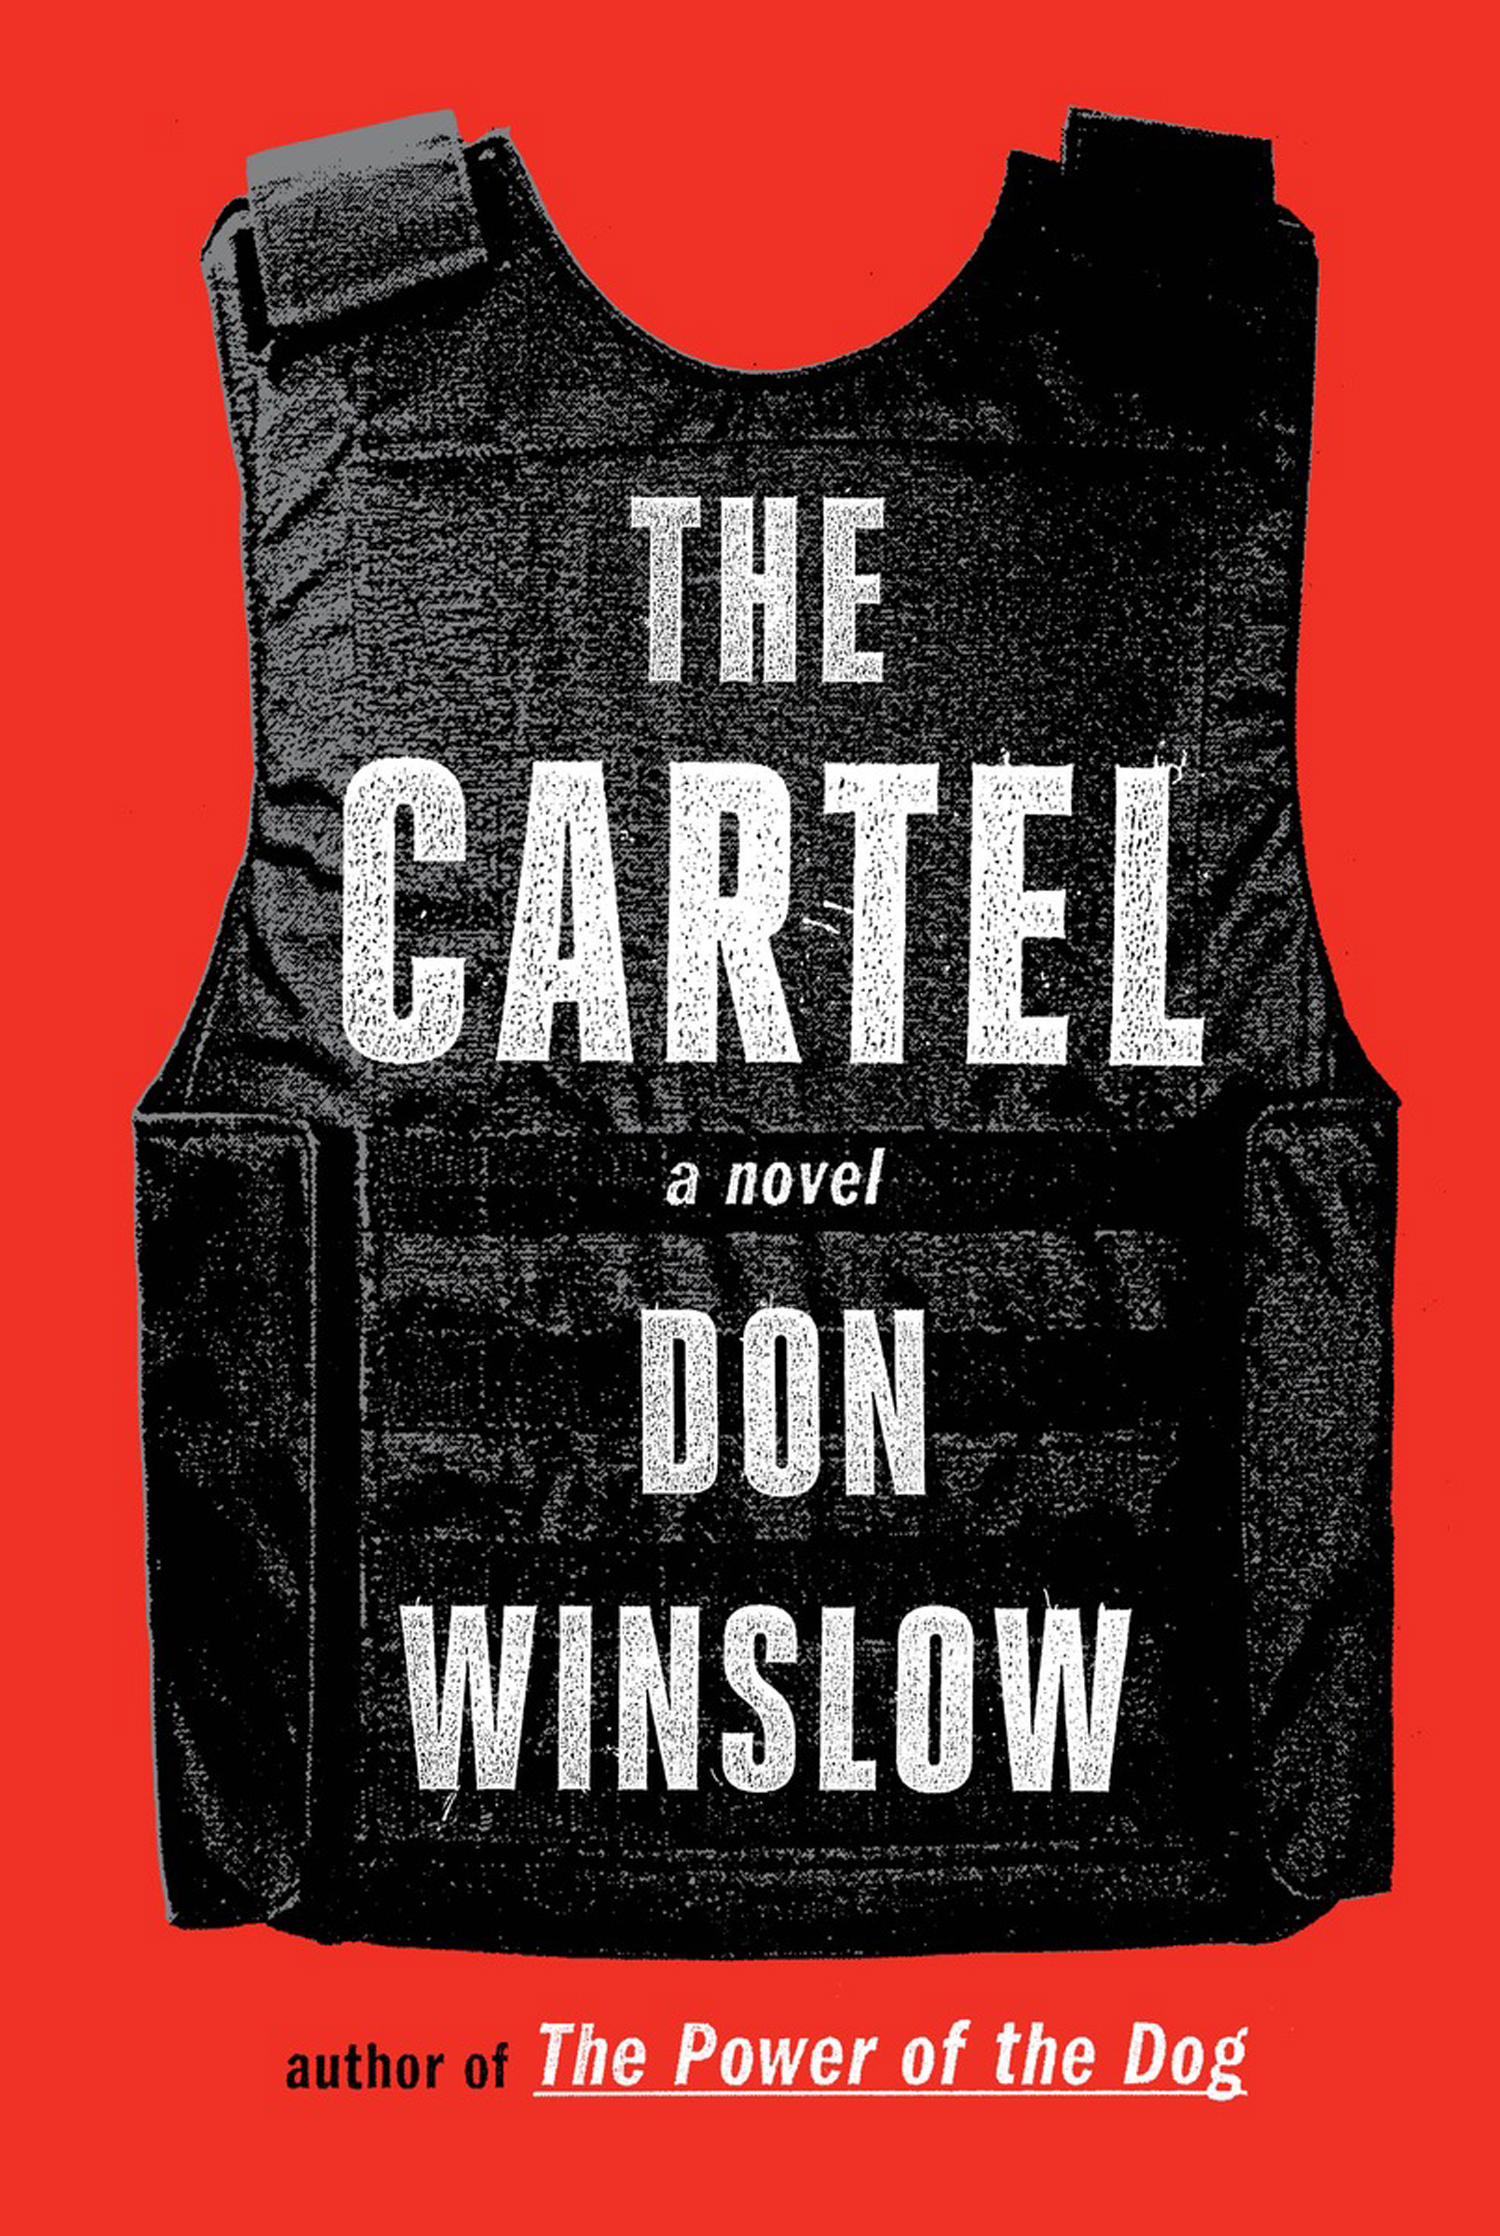 The Cartel_Don Winslow.jpg